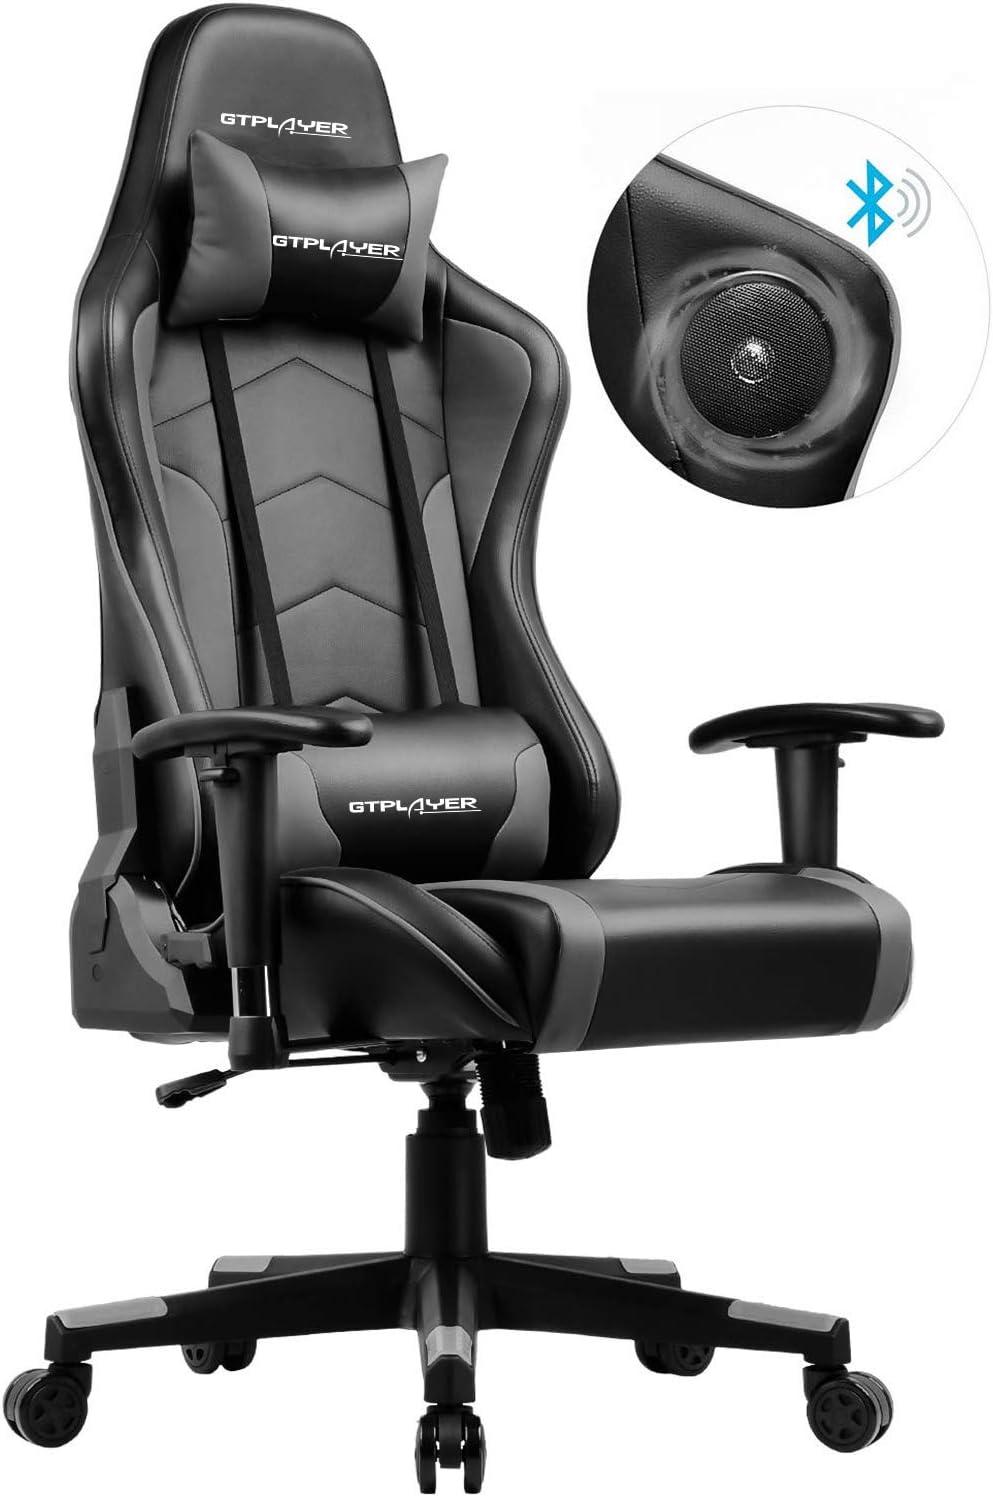 GTPLAYER Silla Gaming con Altavoz Bluetooth Escritorio Oficina Gamer Ergonomica con Cojín Reposabrazos 3D Ajustables Respaldo Reclinable Multifuncional GTRACING Series (Gris)